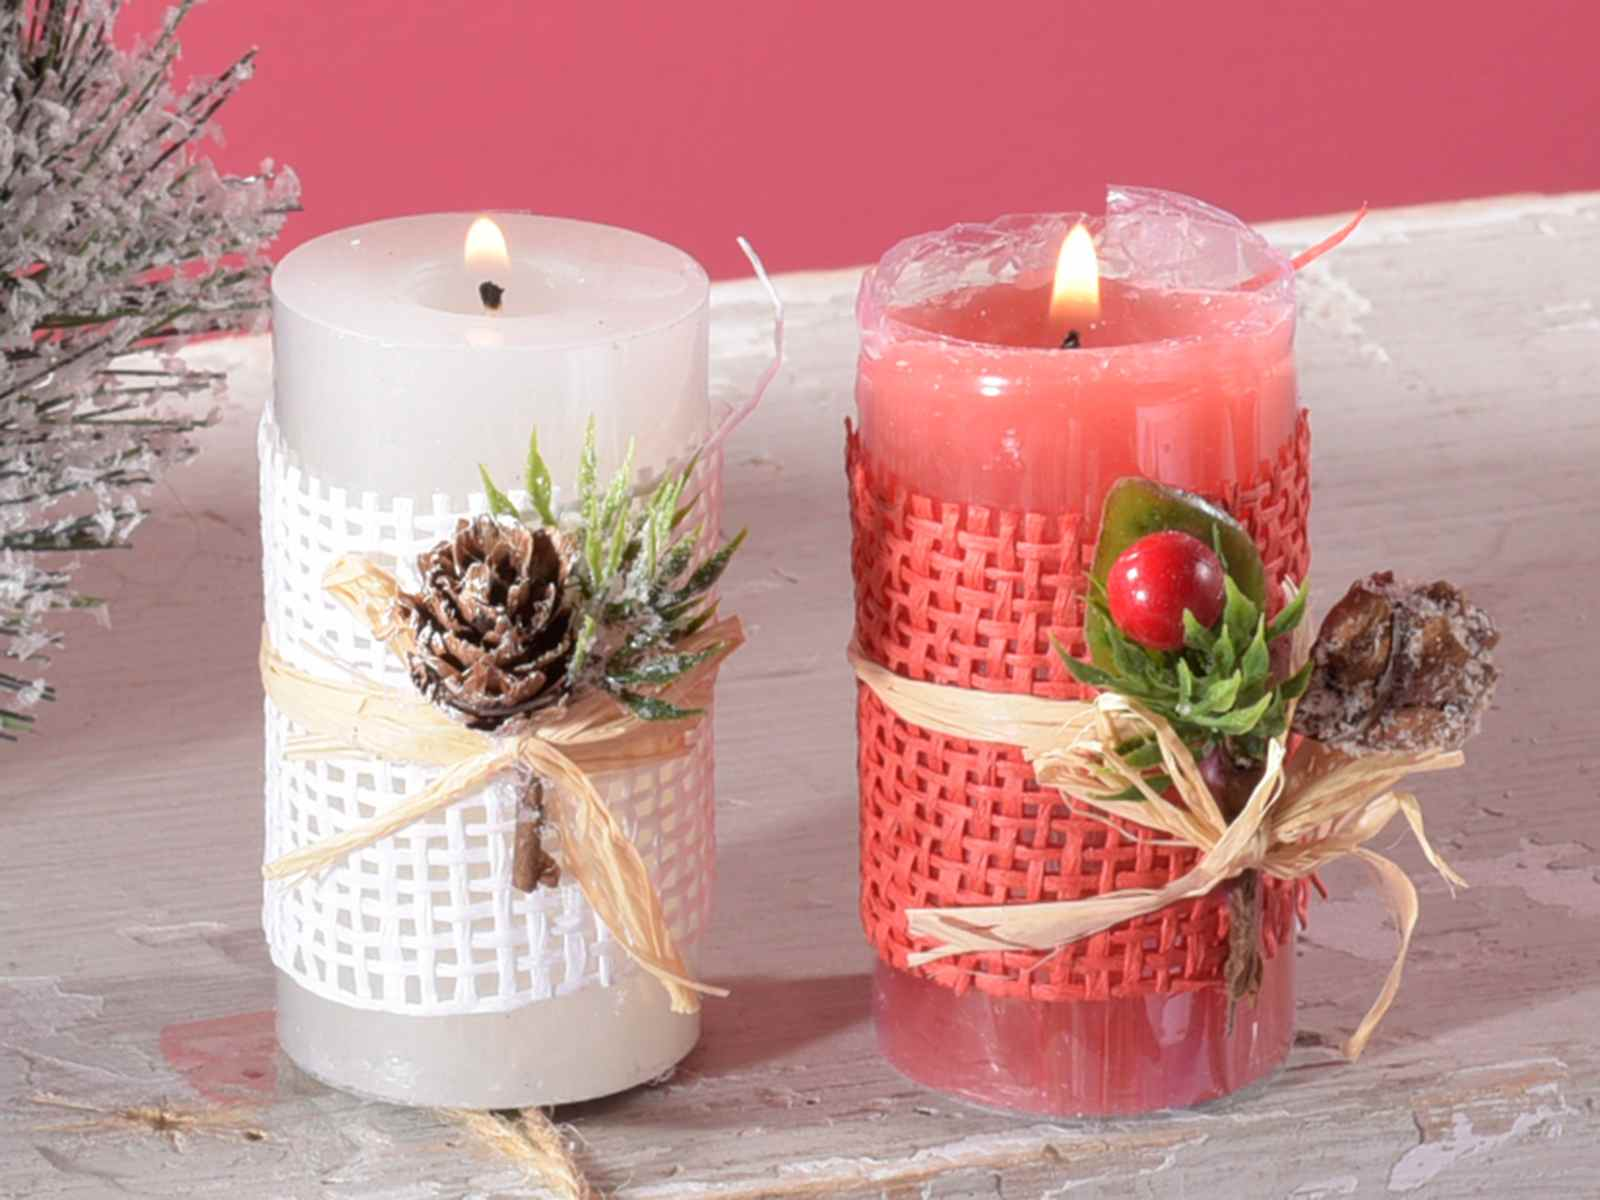 Decorare Candele Natale : Espositore 12 candele c decori natalizie in conf. singola 14.09.84